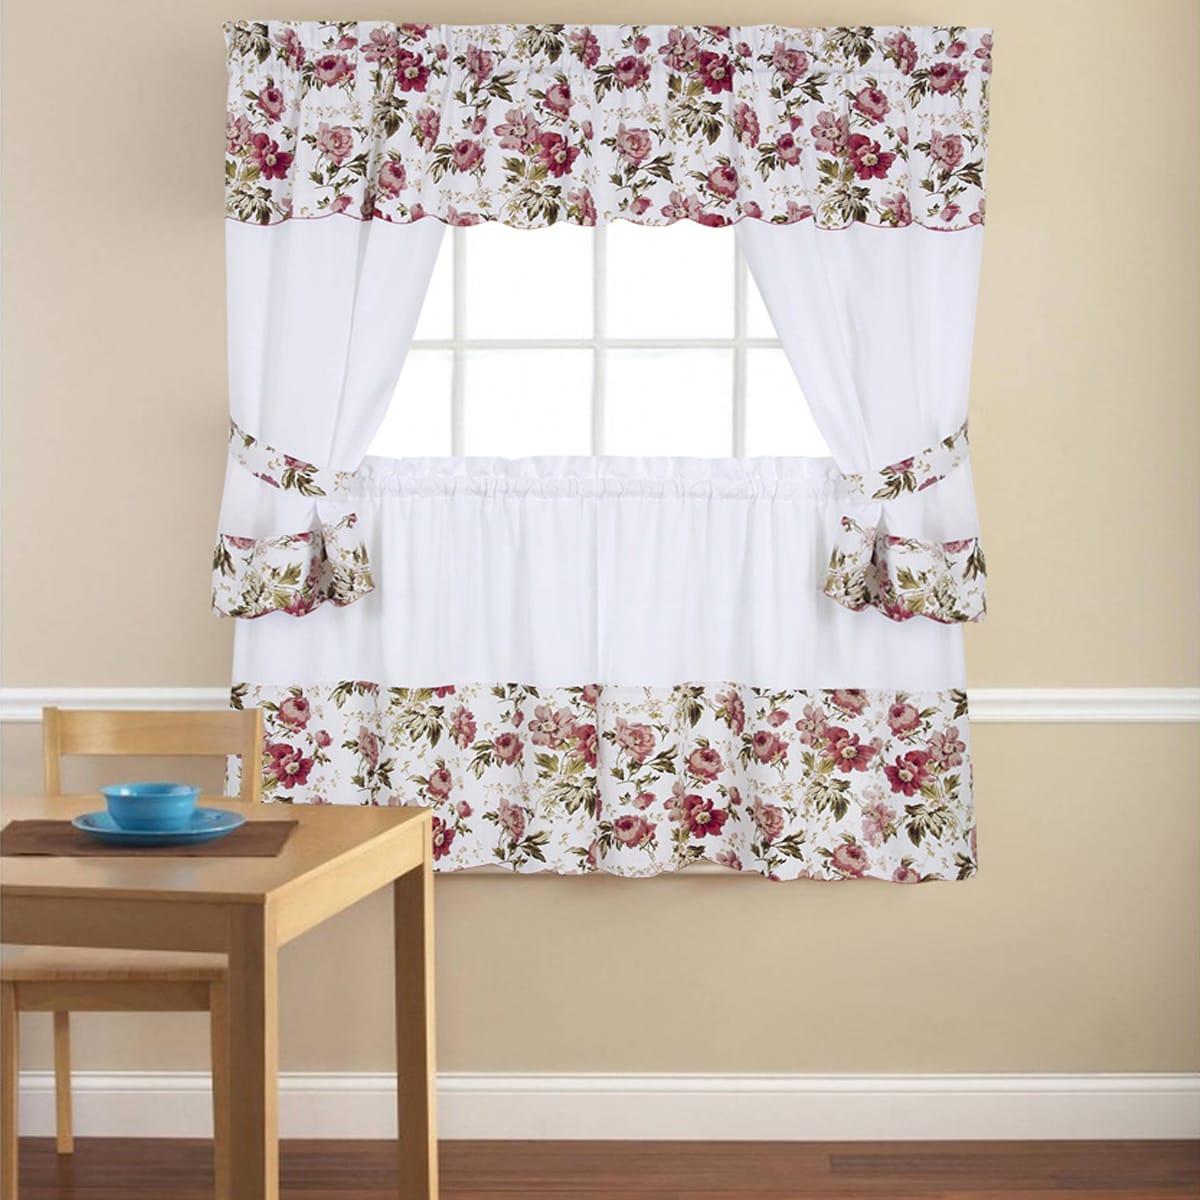 5 Piece Printed Rose Kitchen Curtain Set Overstock 11855640